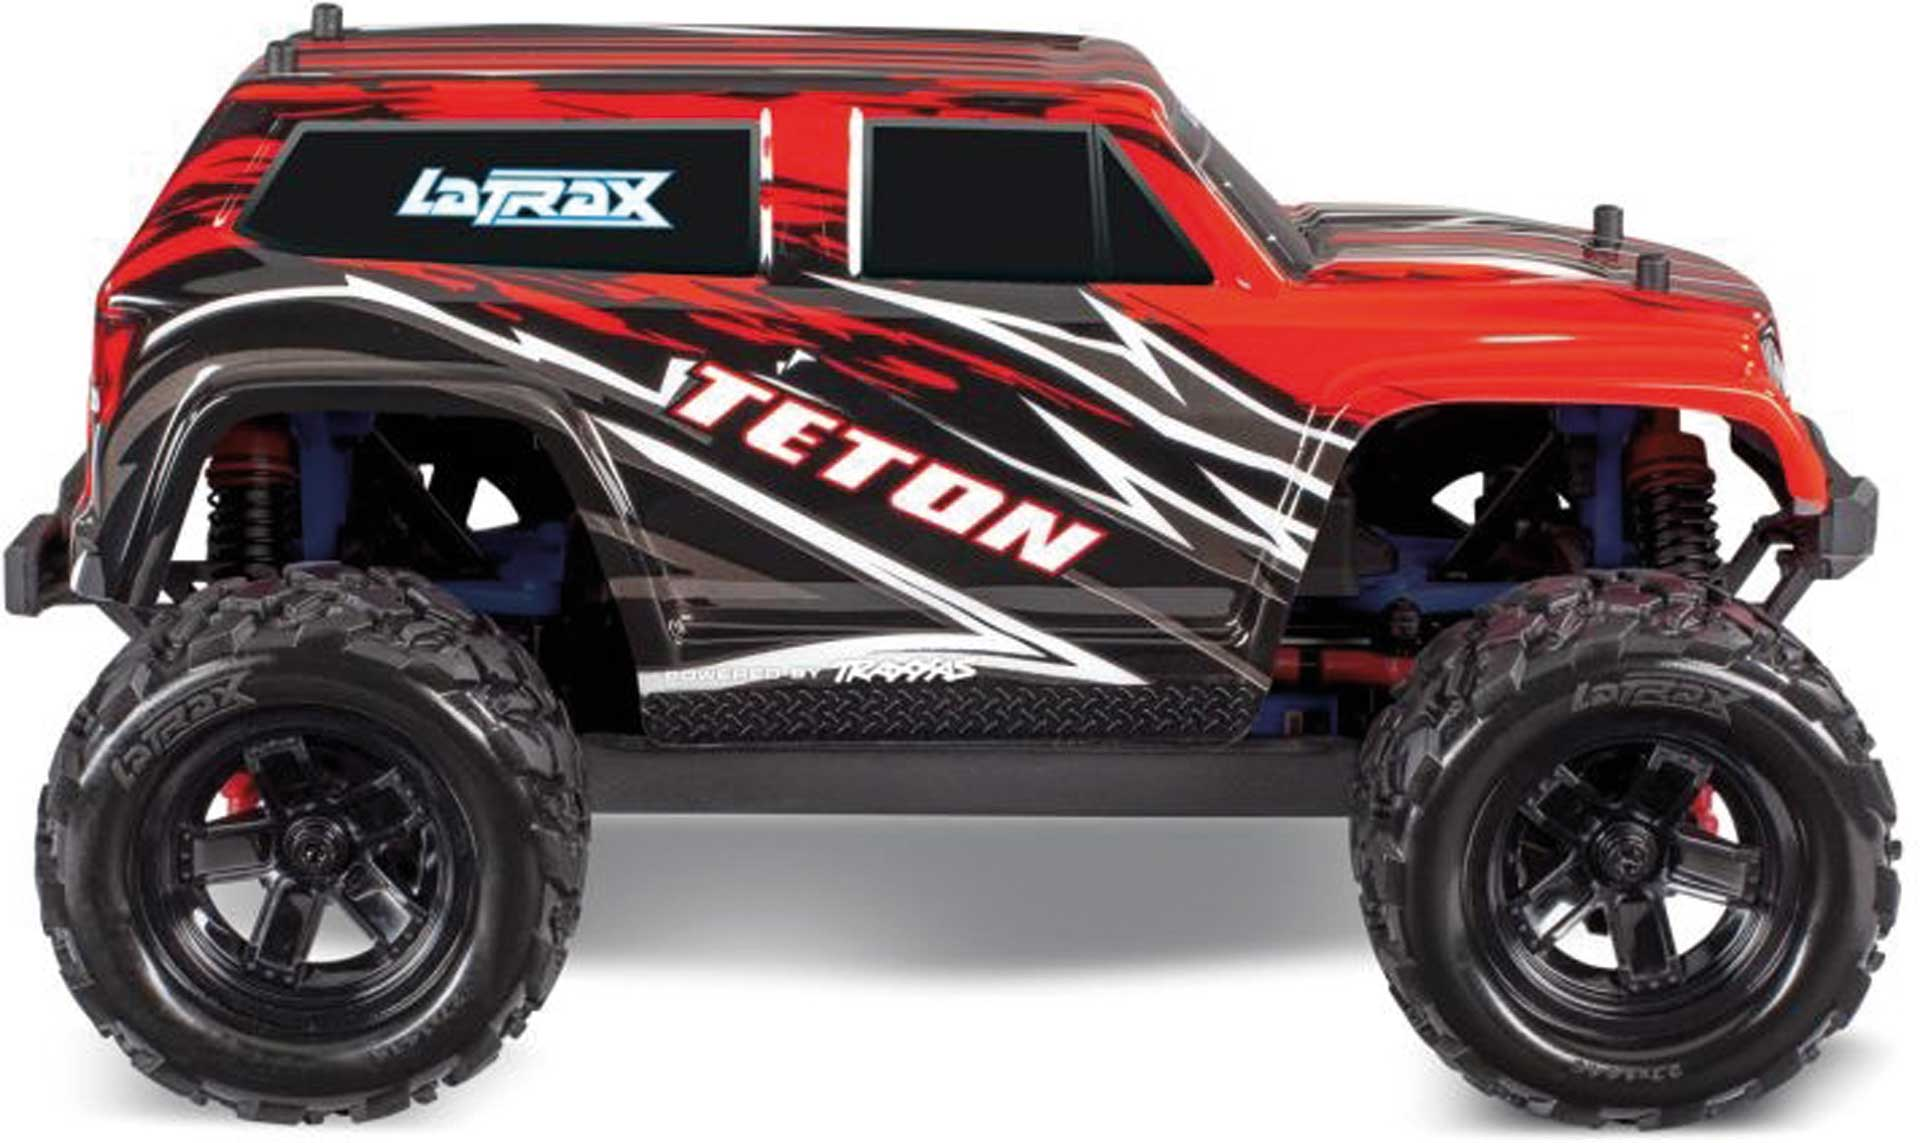 Traxxas TETON 4X4 ROTX RTR +12V-LADER+AKKU 1/18 4WD MONSTER TRUCK BRUSHED